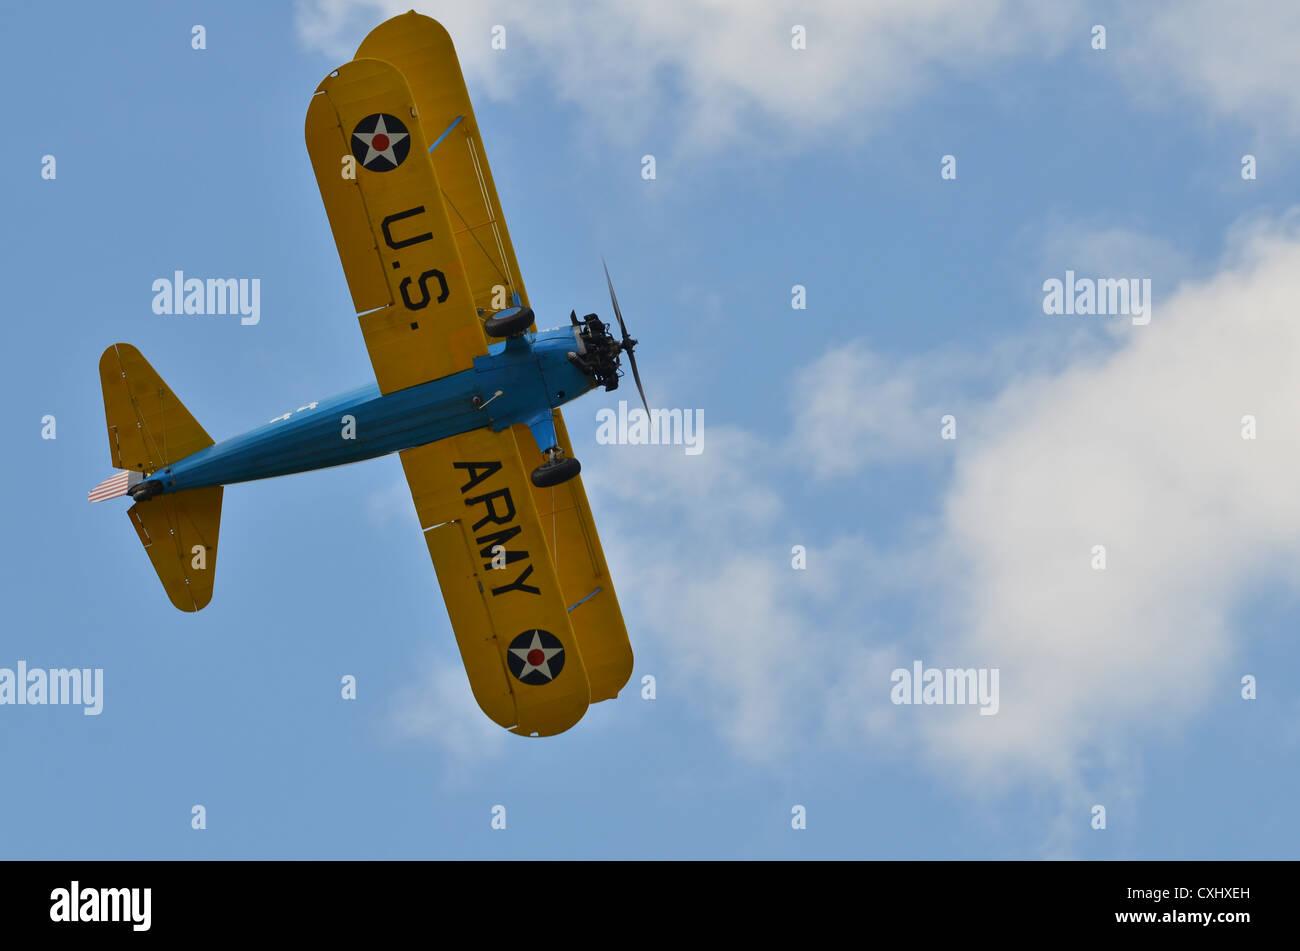 Stearman PT-17 biplane in US Army markings - Stock Image